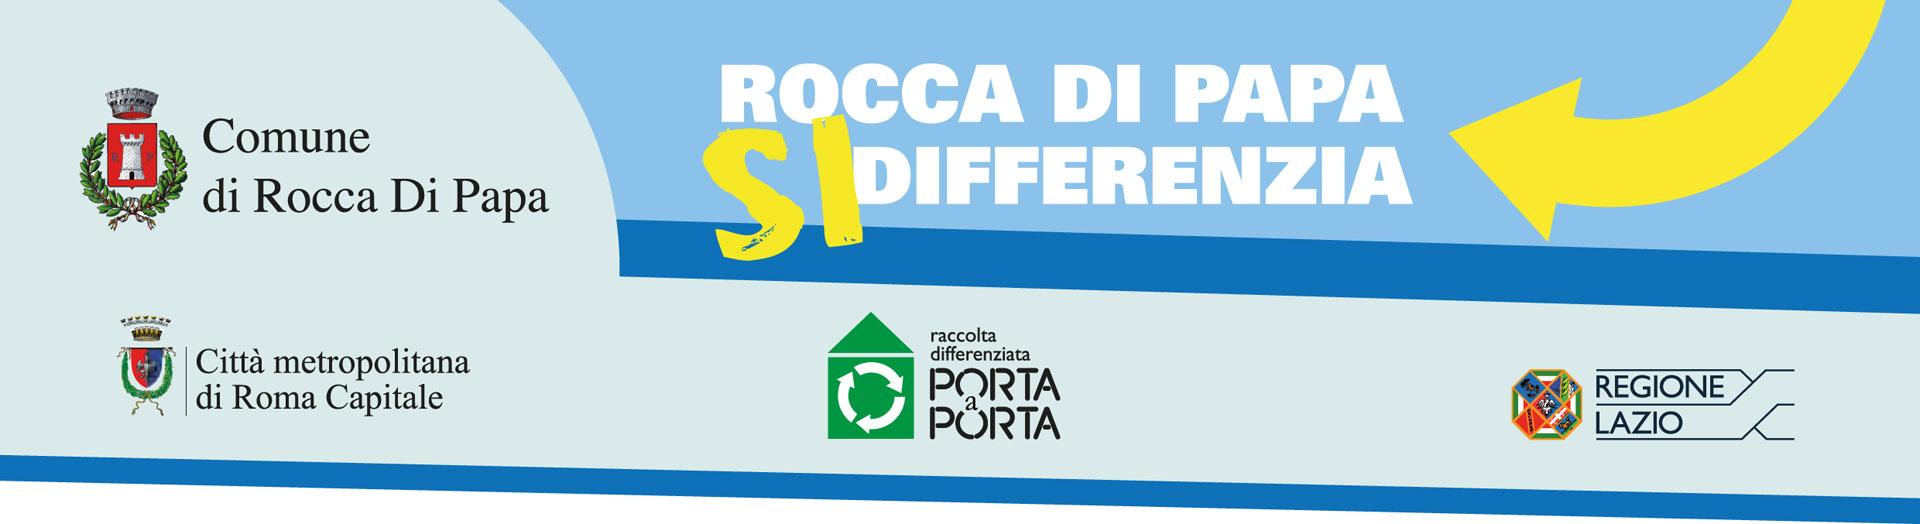 RoccadiPapa_sidifferenzia